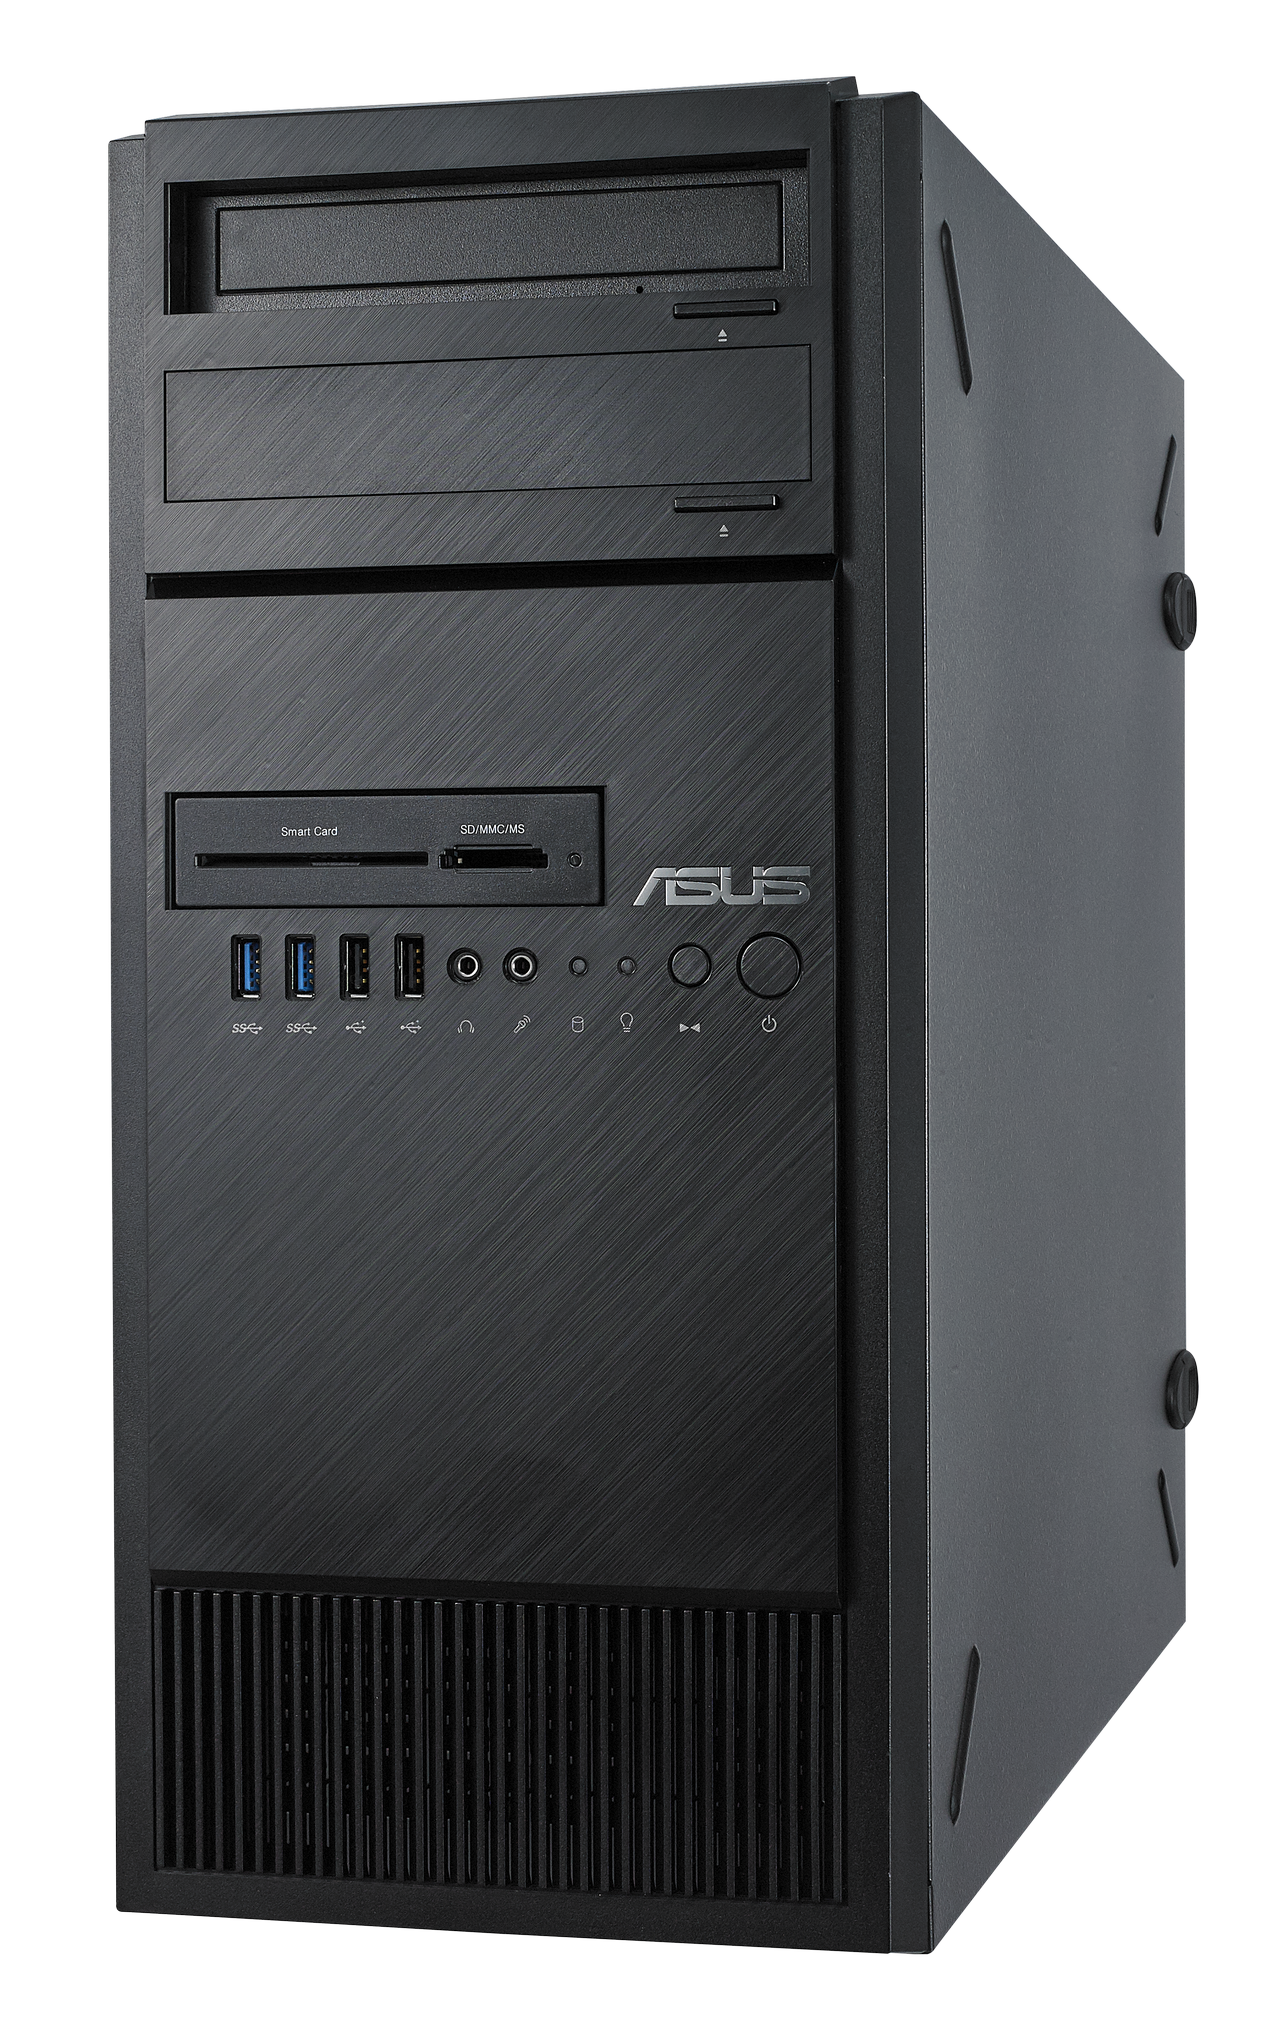 ASUS-Mehlow-Workstation-E500-G5.png